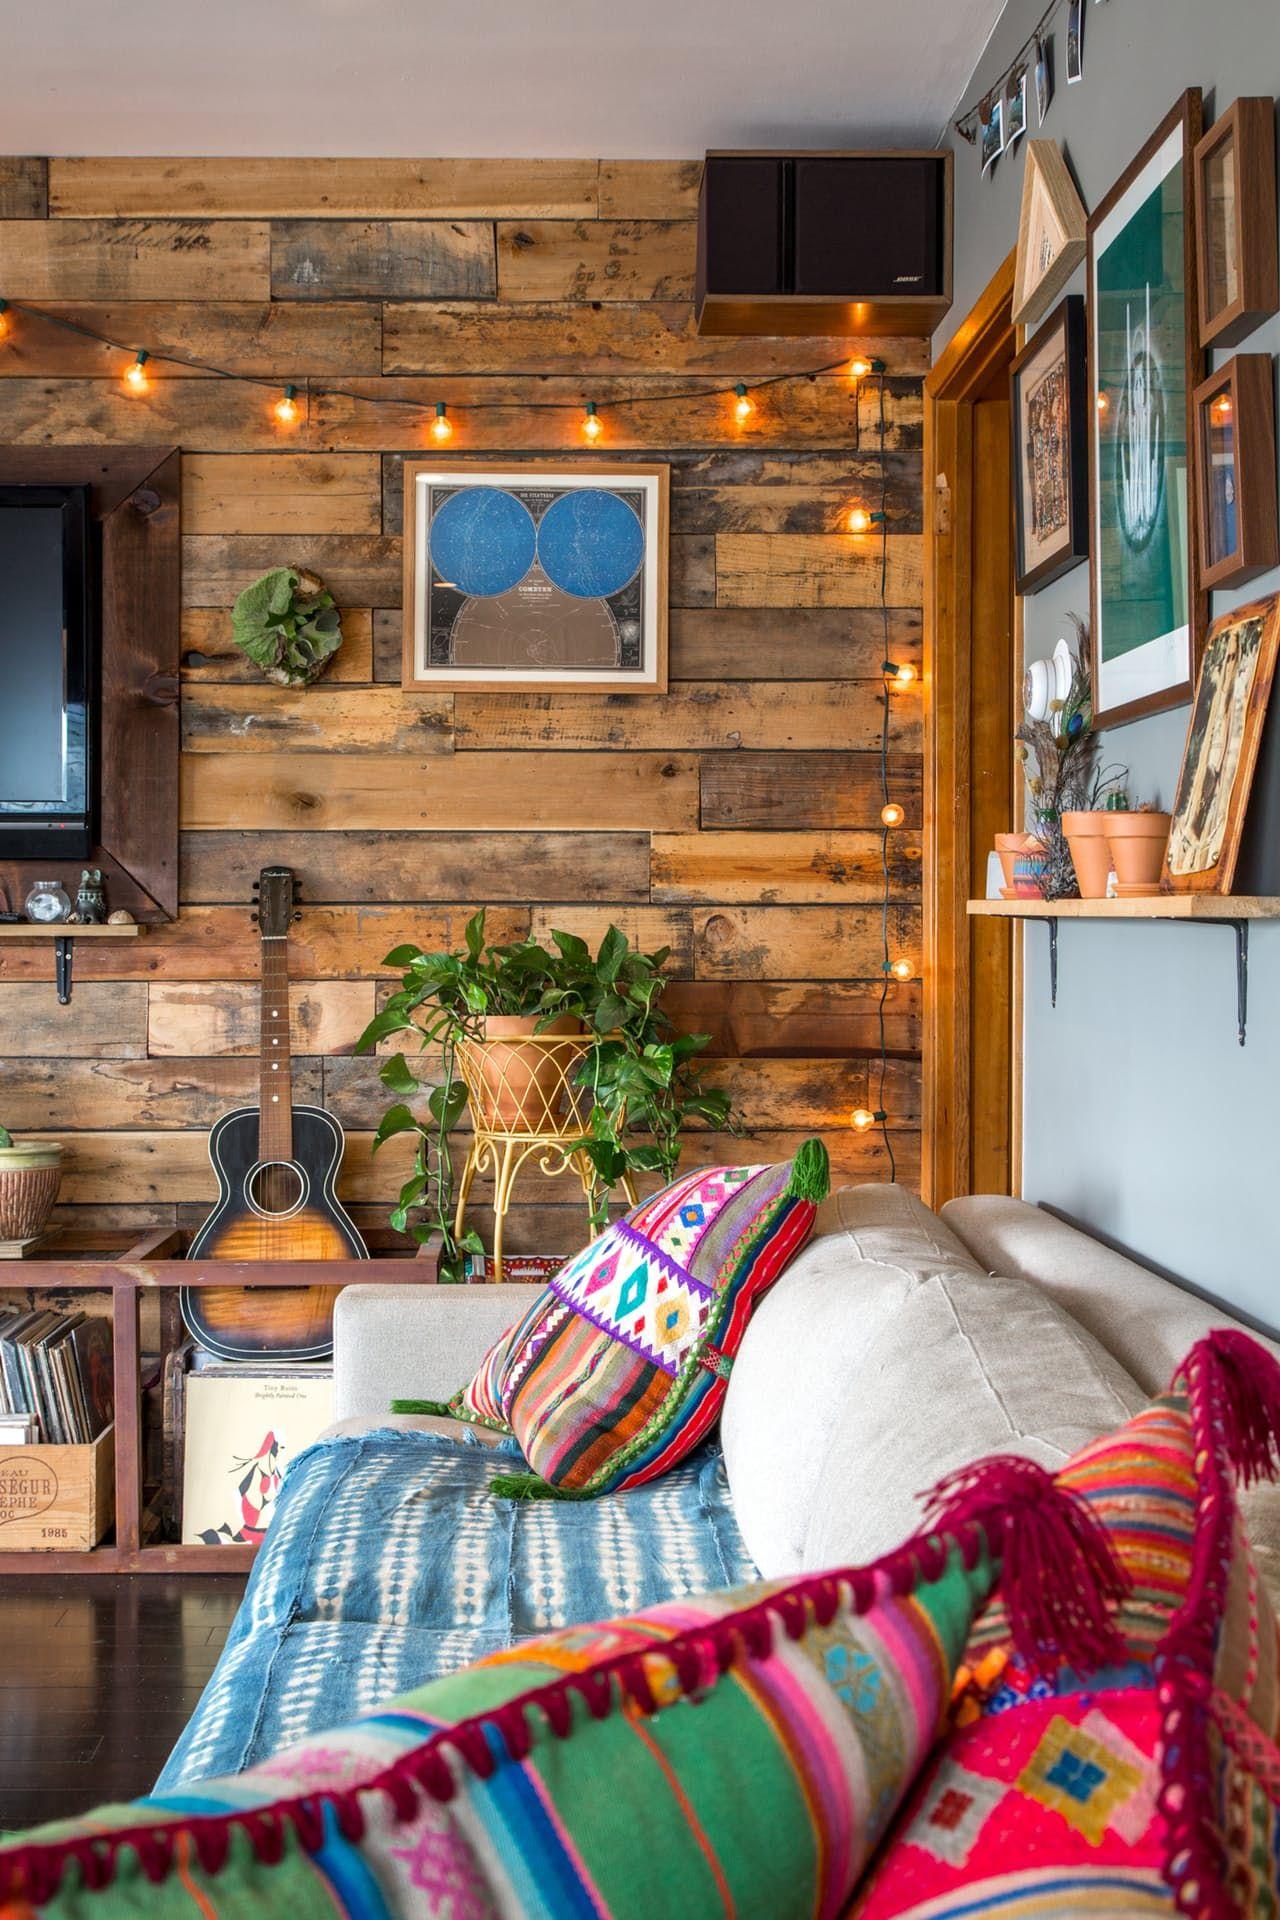 Rustic Boho Living Room Ideas: Rustic & Cozy Cabin Vibes In Los Angeles